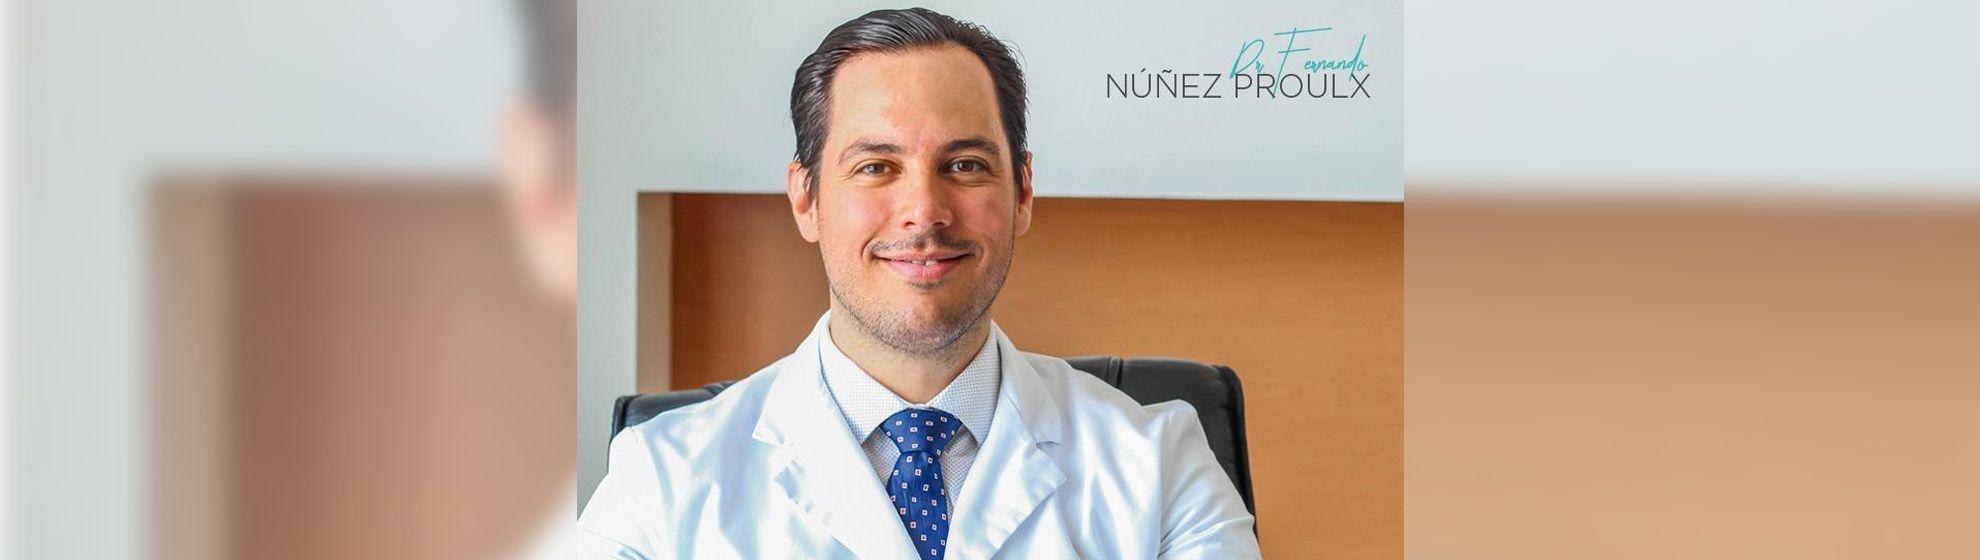 Dr. Fernando Núñez Proulx